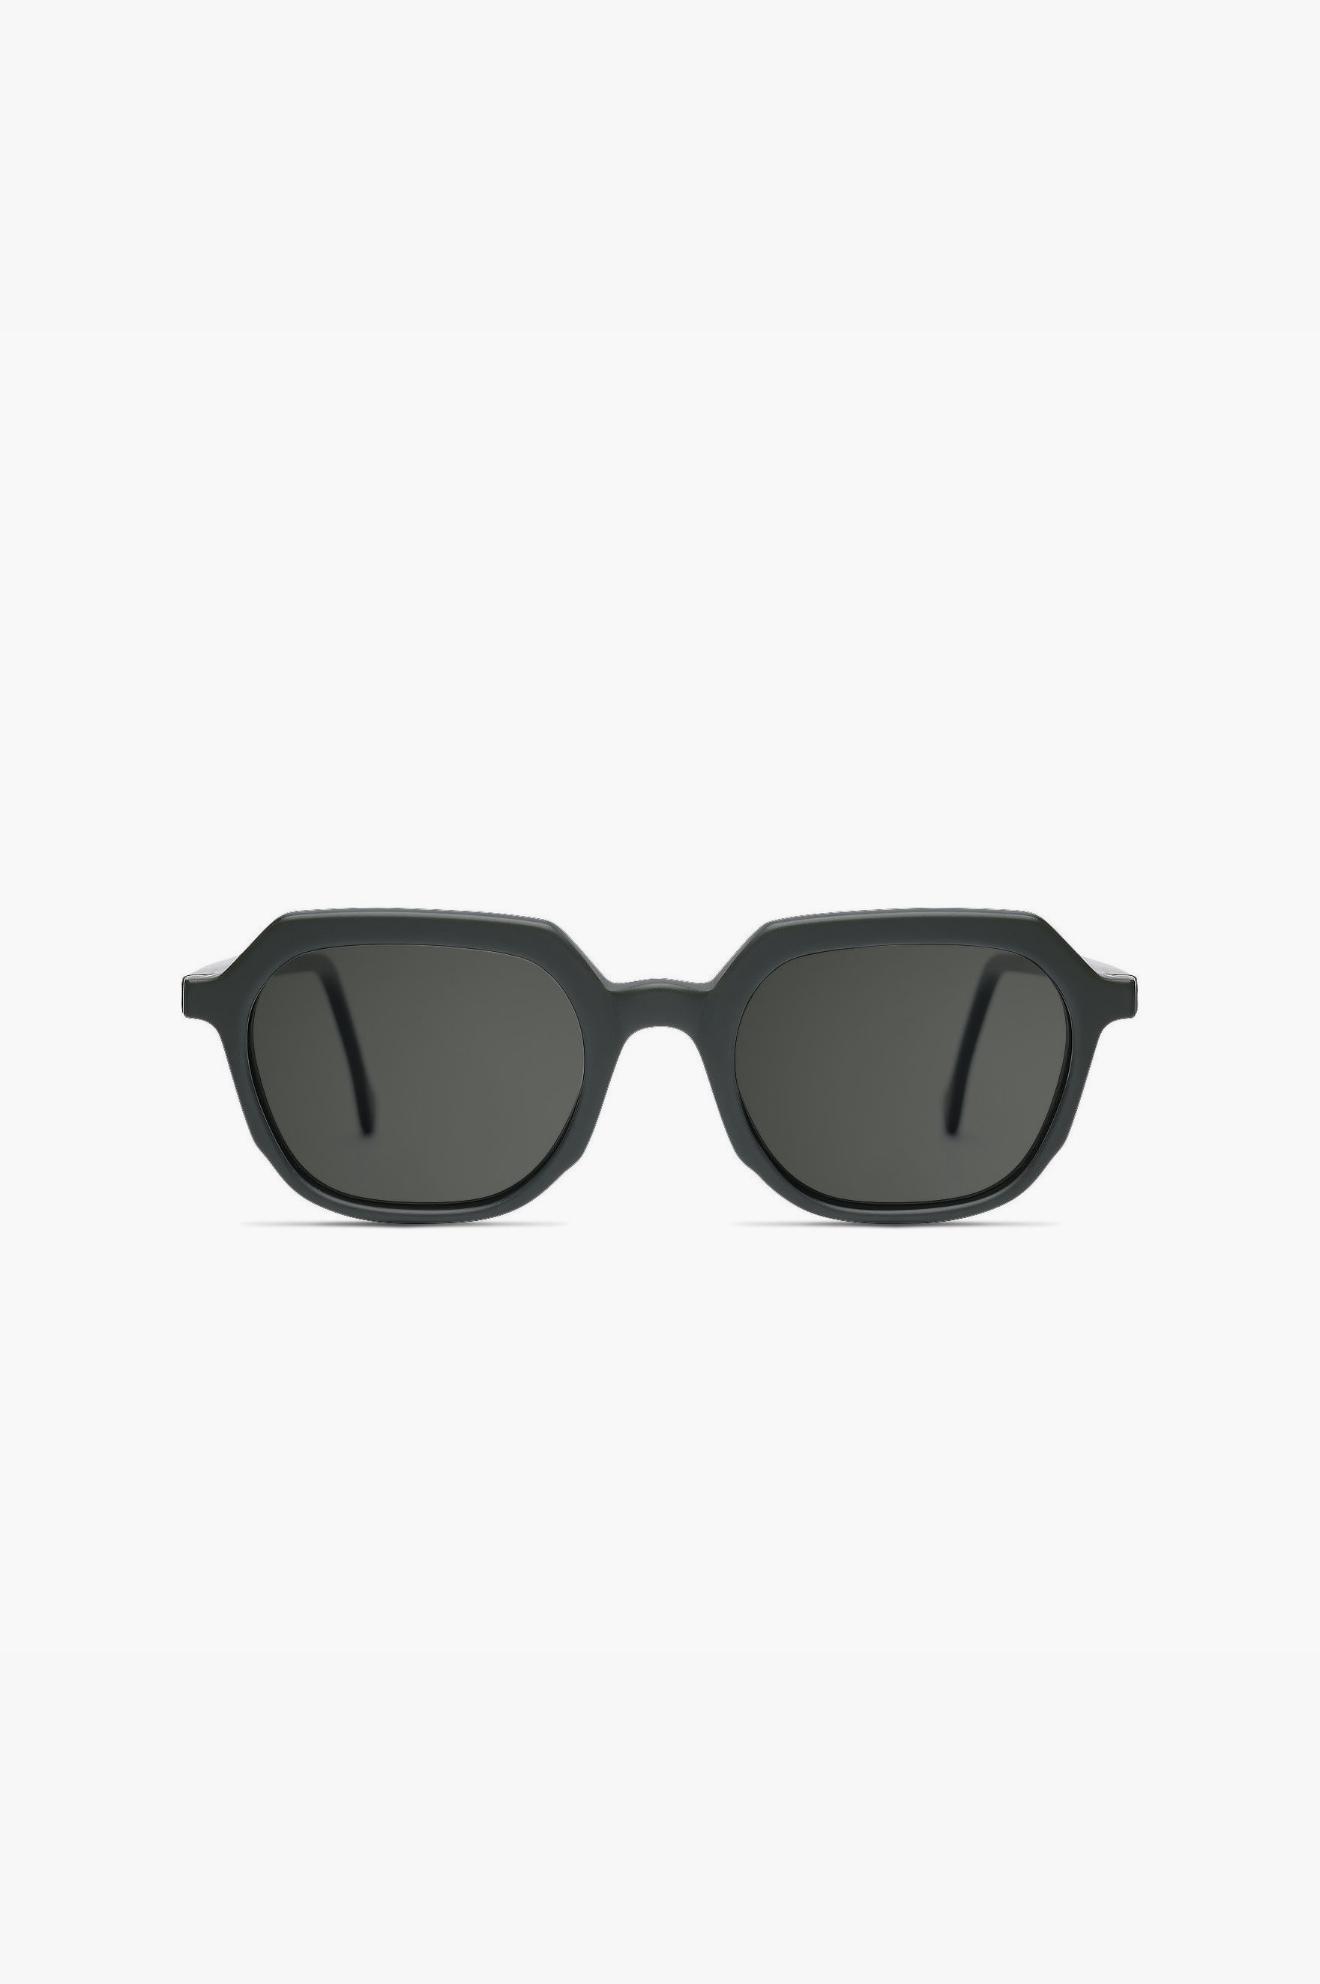 Aliados Sunglasses Army Green Matte